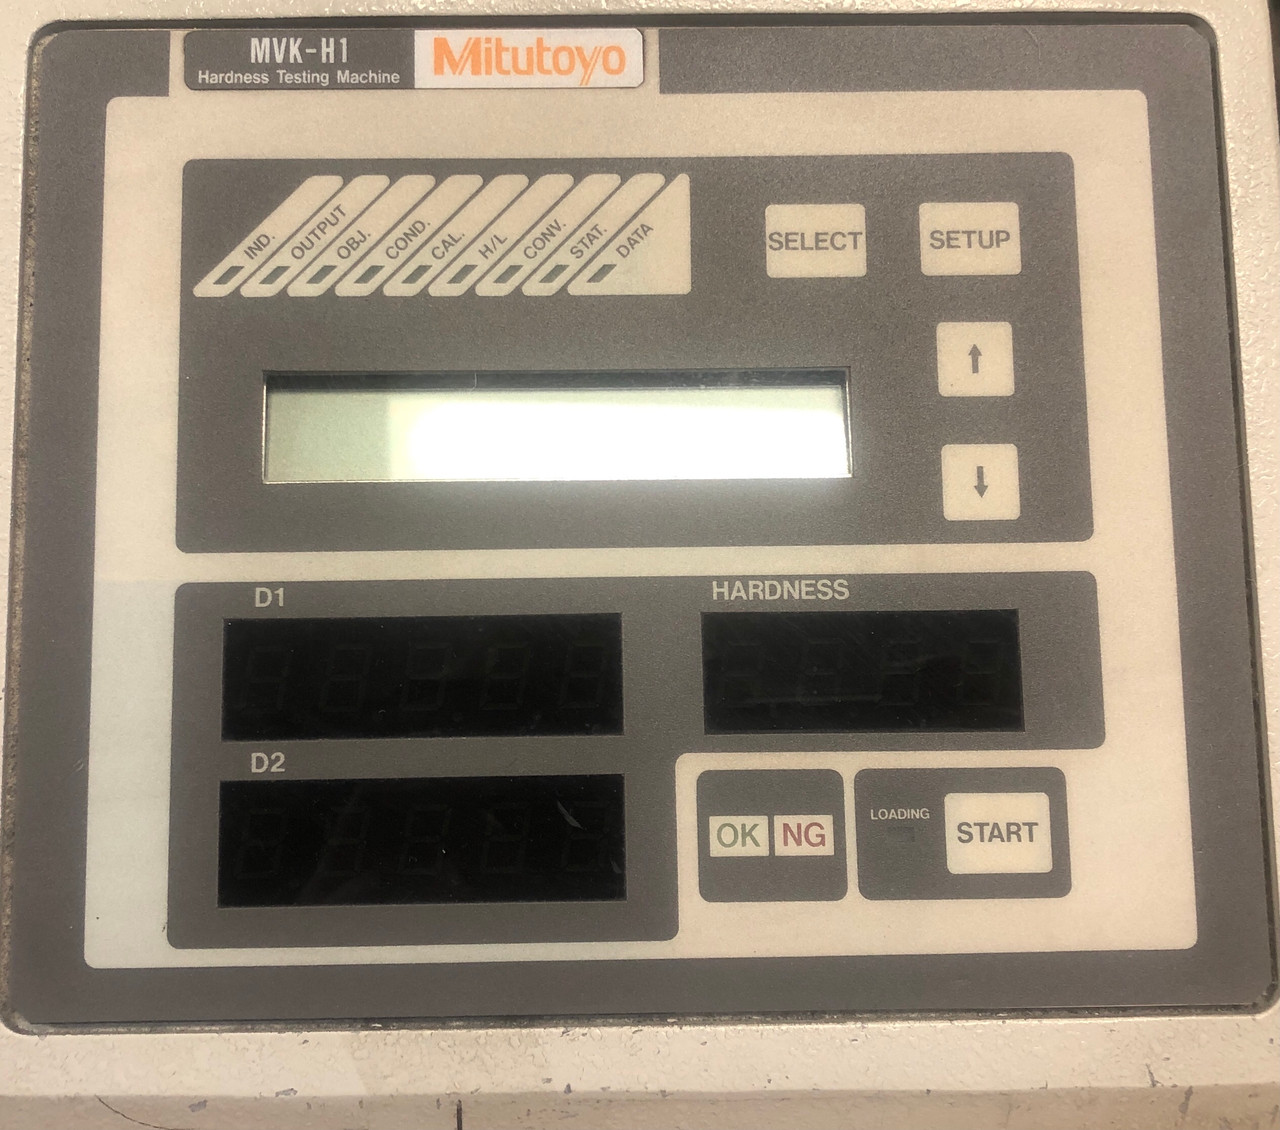 Mitutoyo MVK-H100 Hardness Testing Machine w/ Olympus PM-CP-3